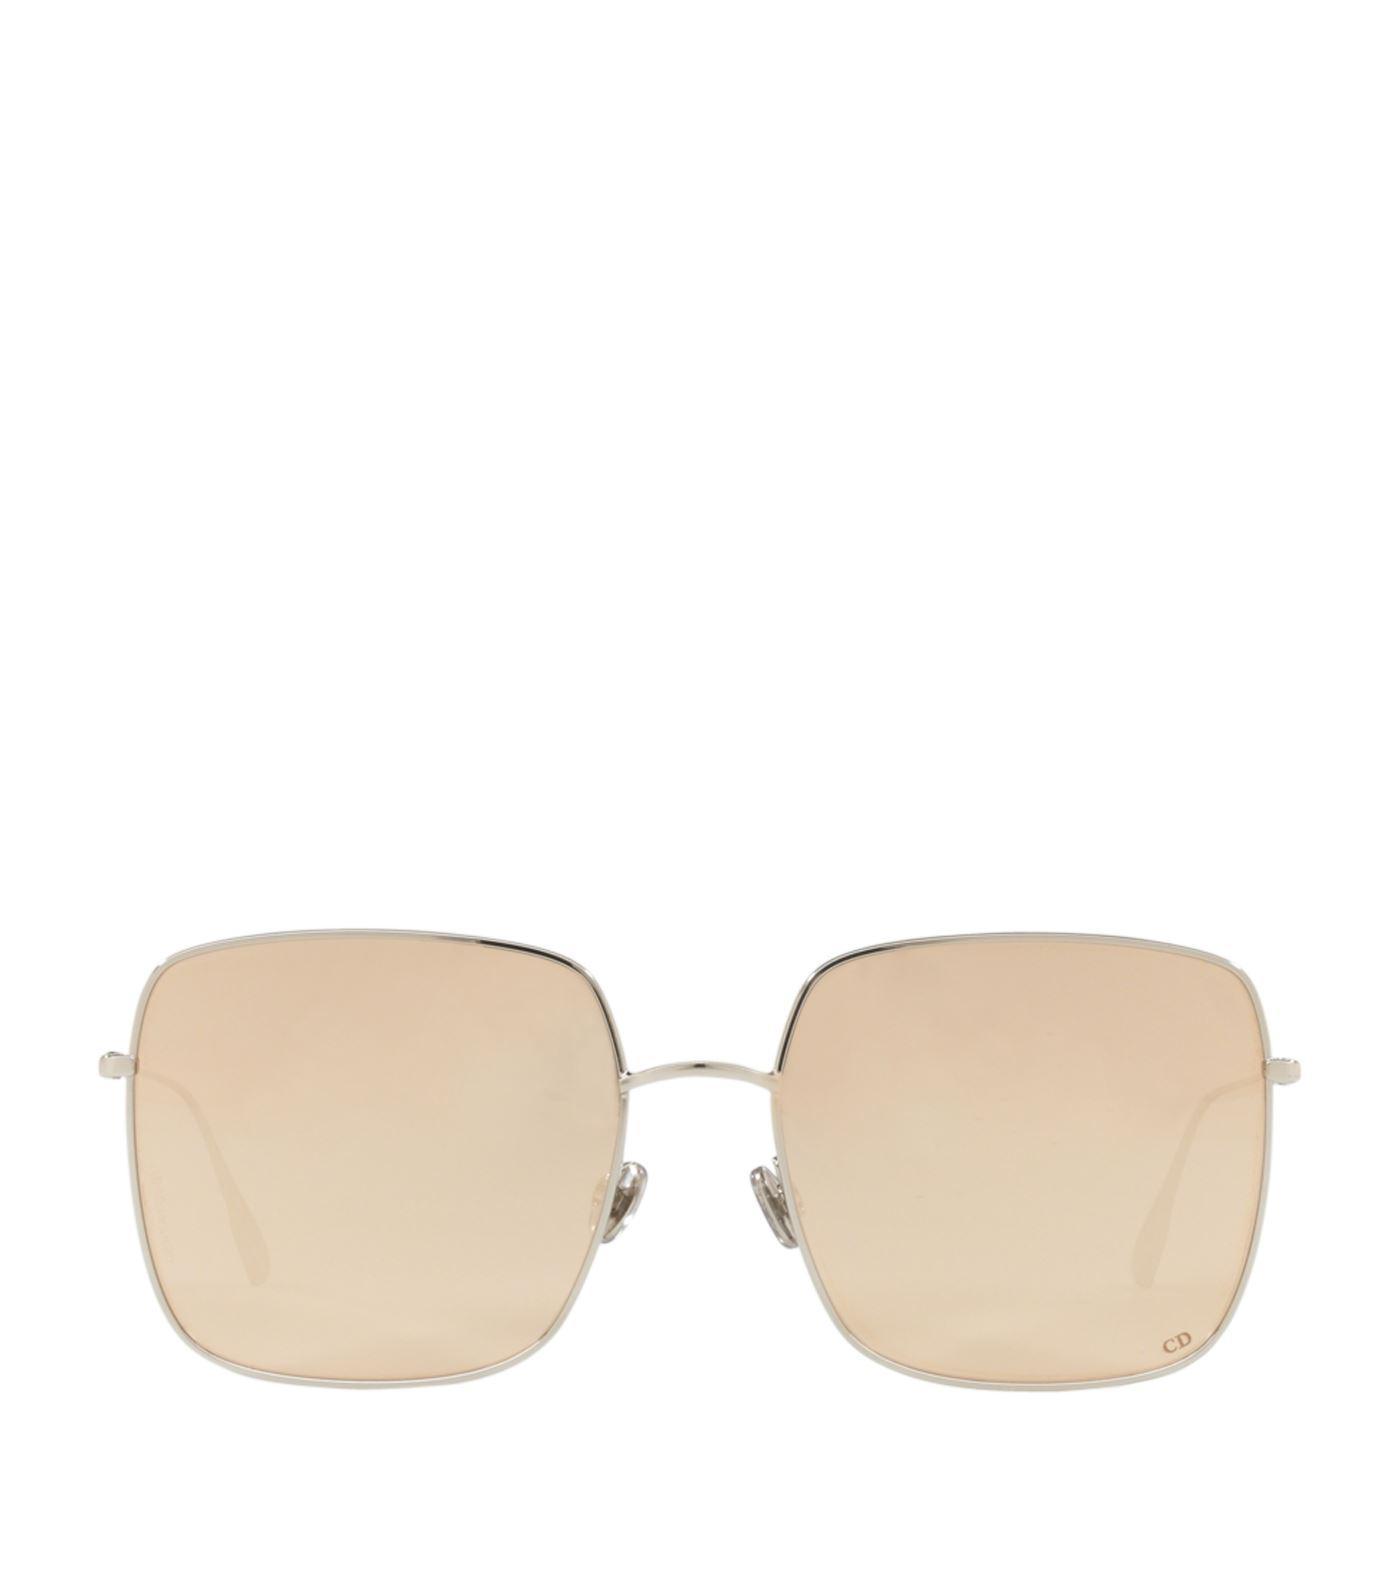 d22b2dbdc7 Dior Stellaire Square Sunglasses in Metallic - Lyst